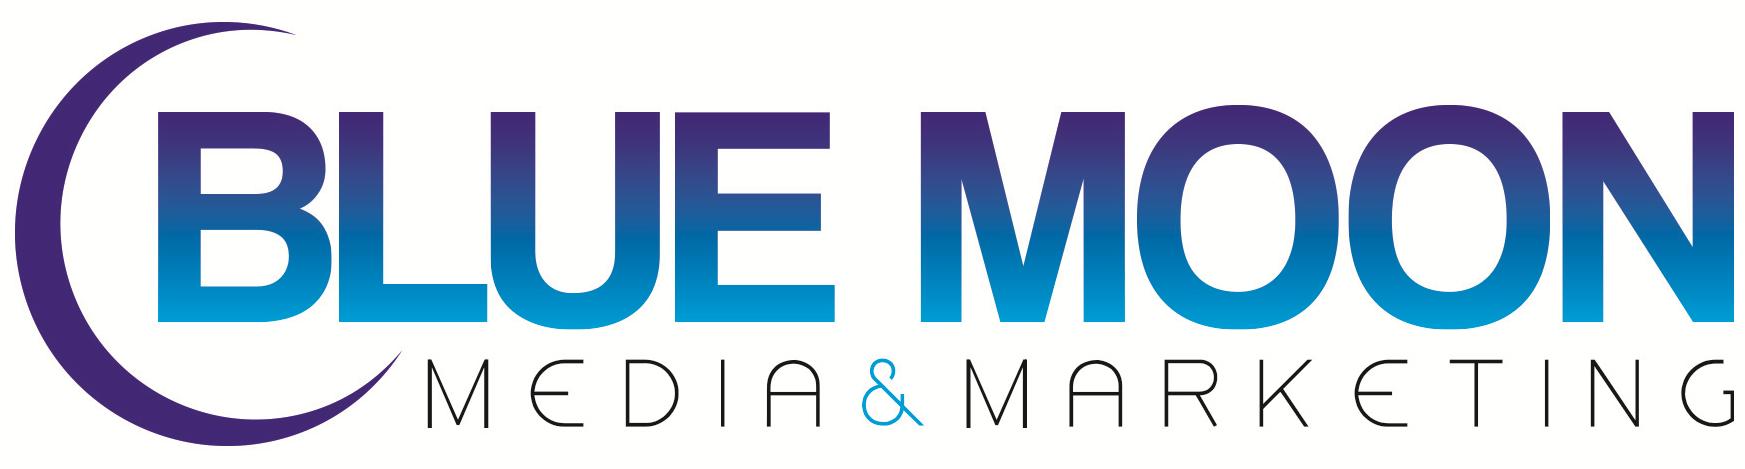 BMM&M_logo_s